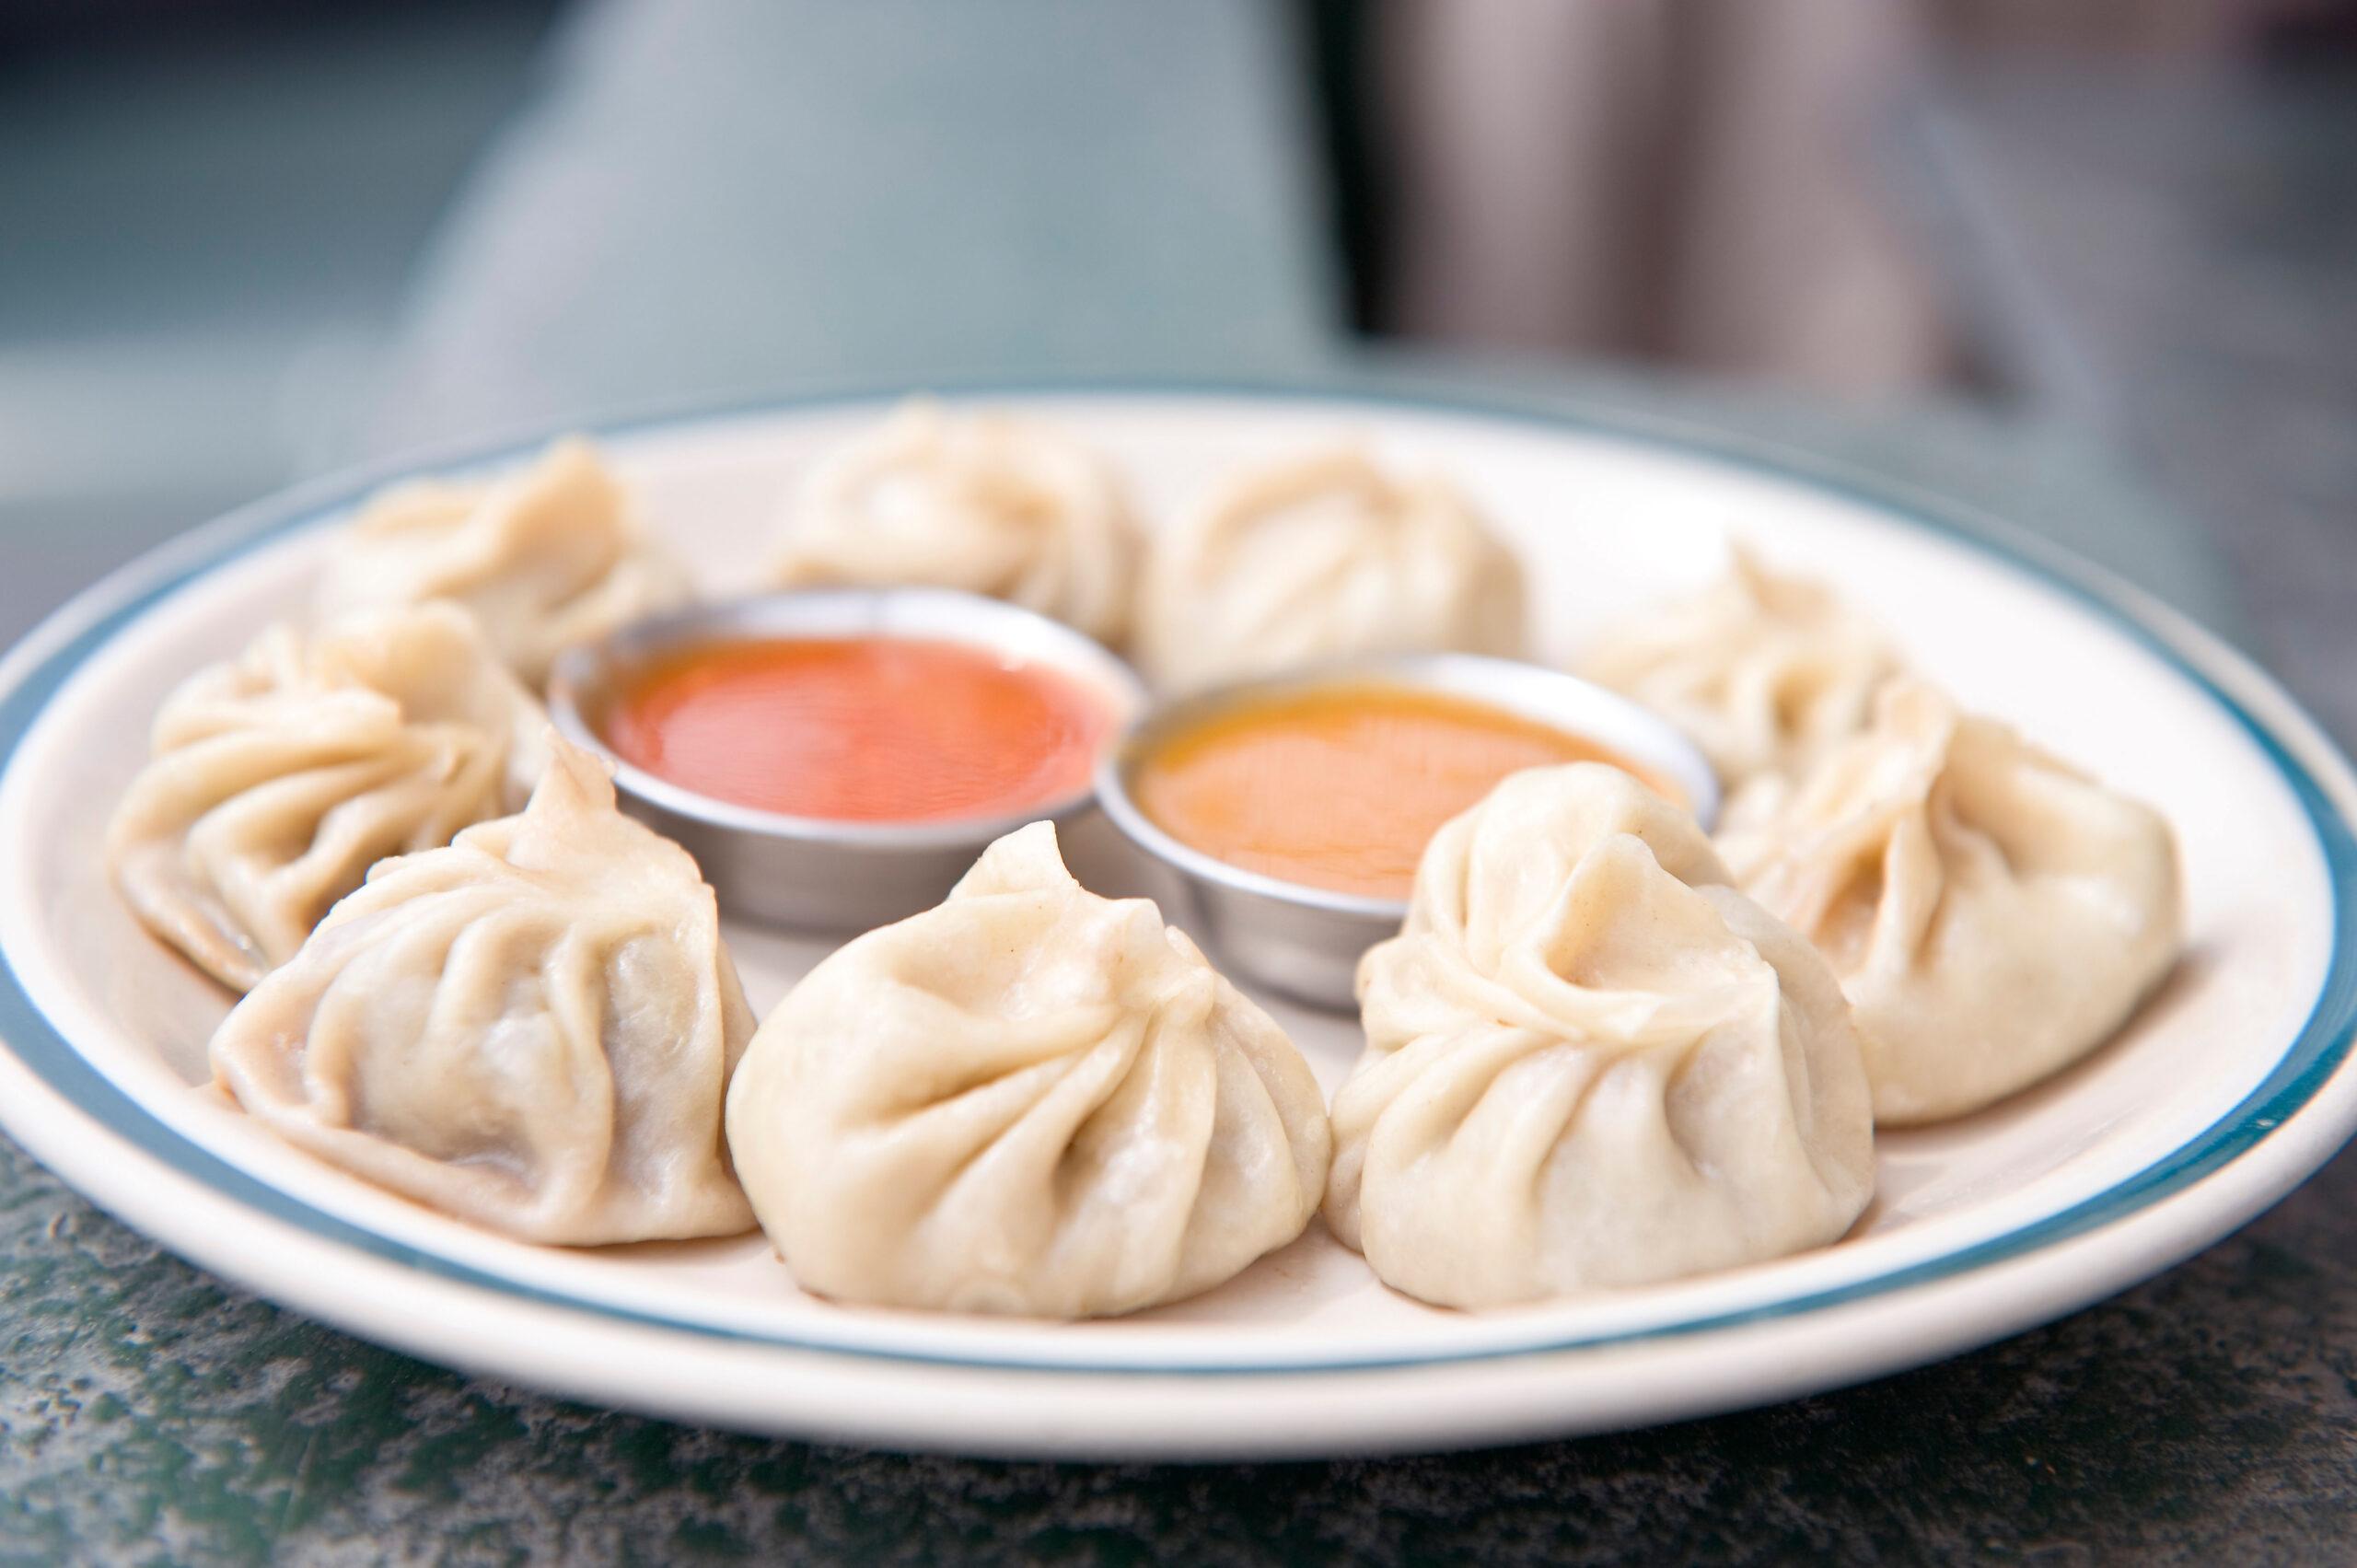 Momo dumplings